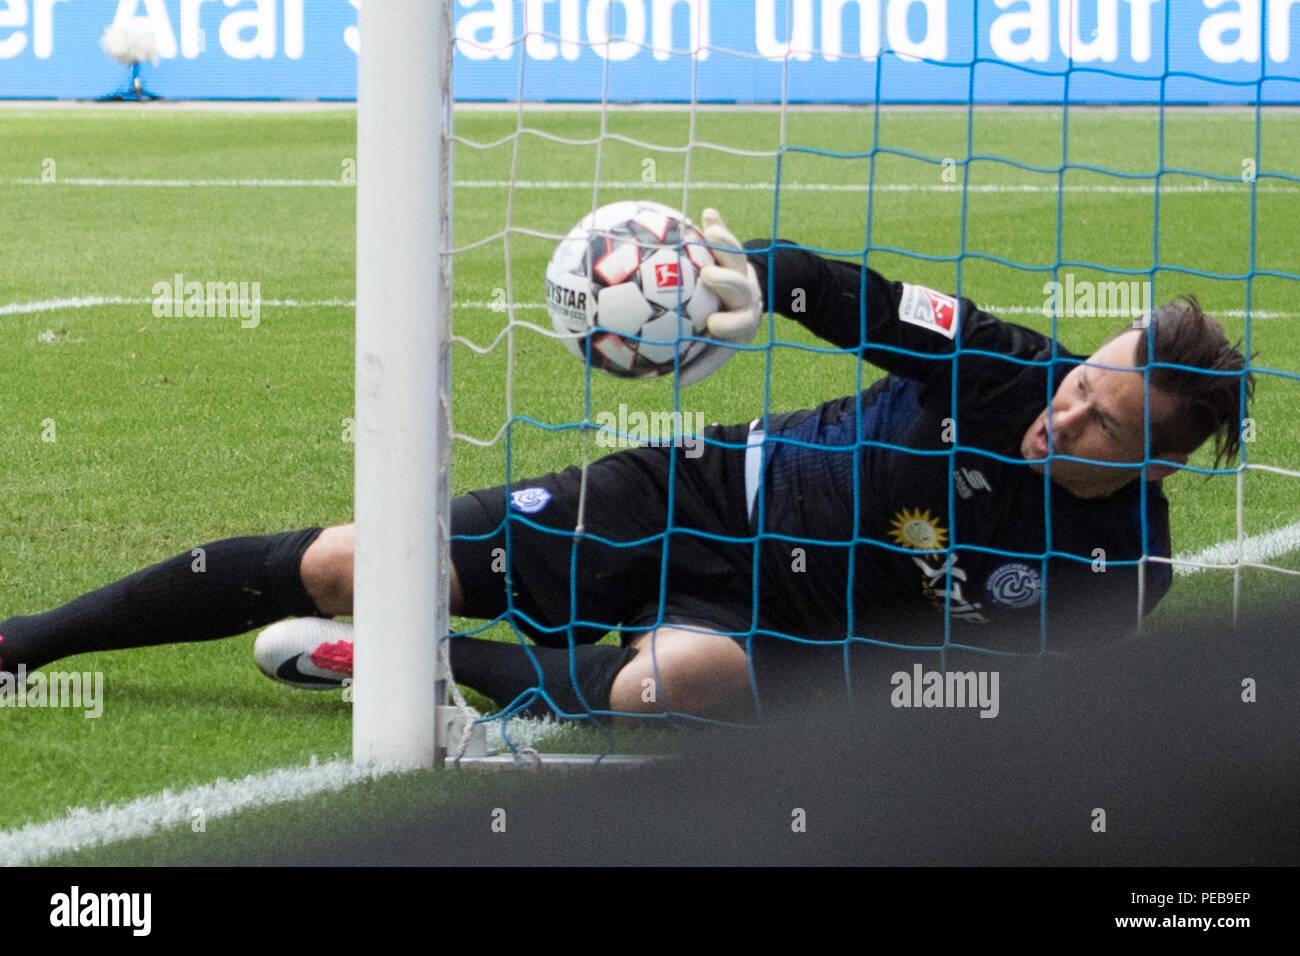 Duisburg, Deutschland. 11th Aug, 2018. Goalkeeper Daniel DAVARI (DU) can not keep the free-kick to 1: 0 for the VFL Bochum, action, goal, football 2nd Bundesliga, 2nd matchday, MSV Duisburg (DU) - VfL Bochum (BO), on 11.08.2018 in Duisburg/Germany. ¬ | usage worldwide Credit: dpa/Alamy Live News - Stock Image